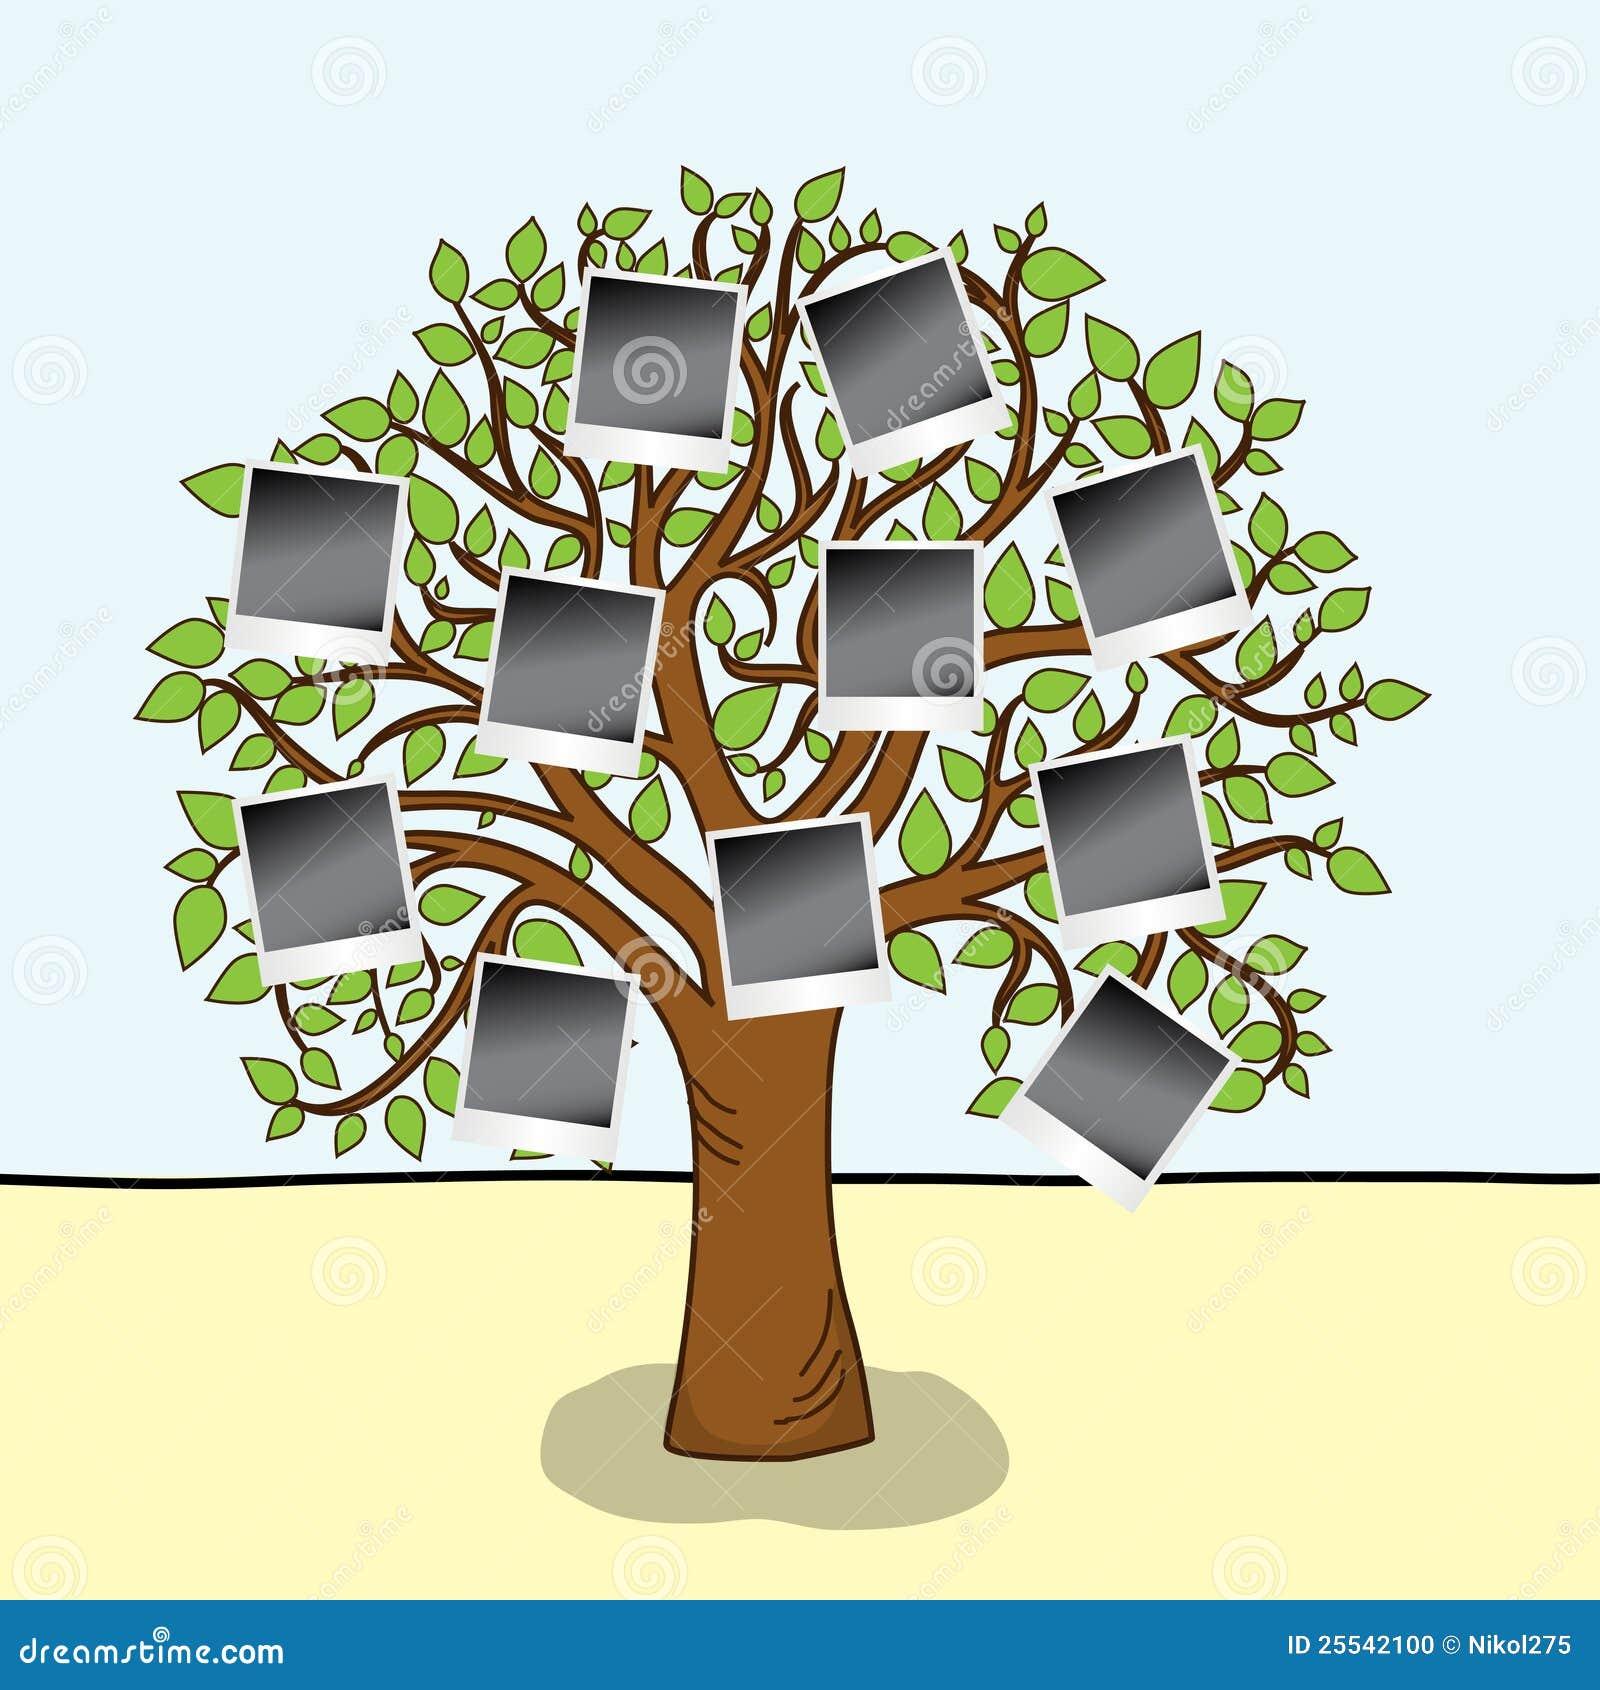 Family album tree with frames for your photos stock for Nombres de arboles en ingles